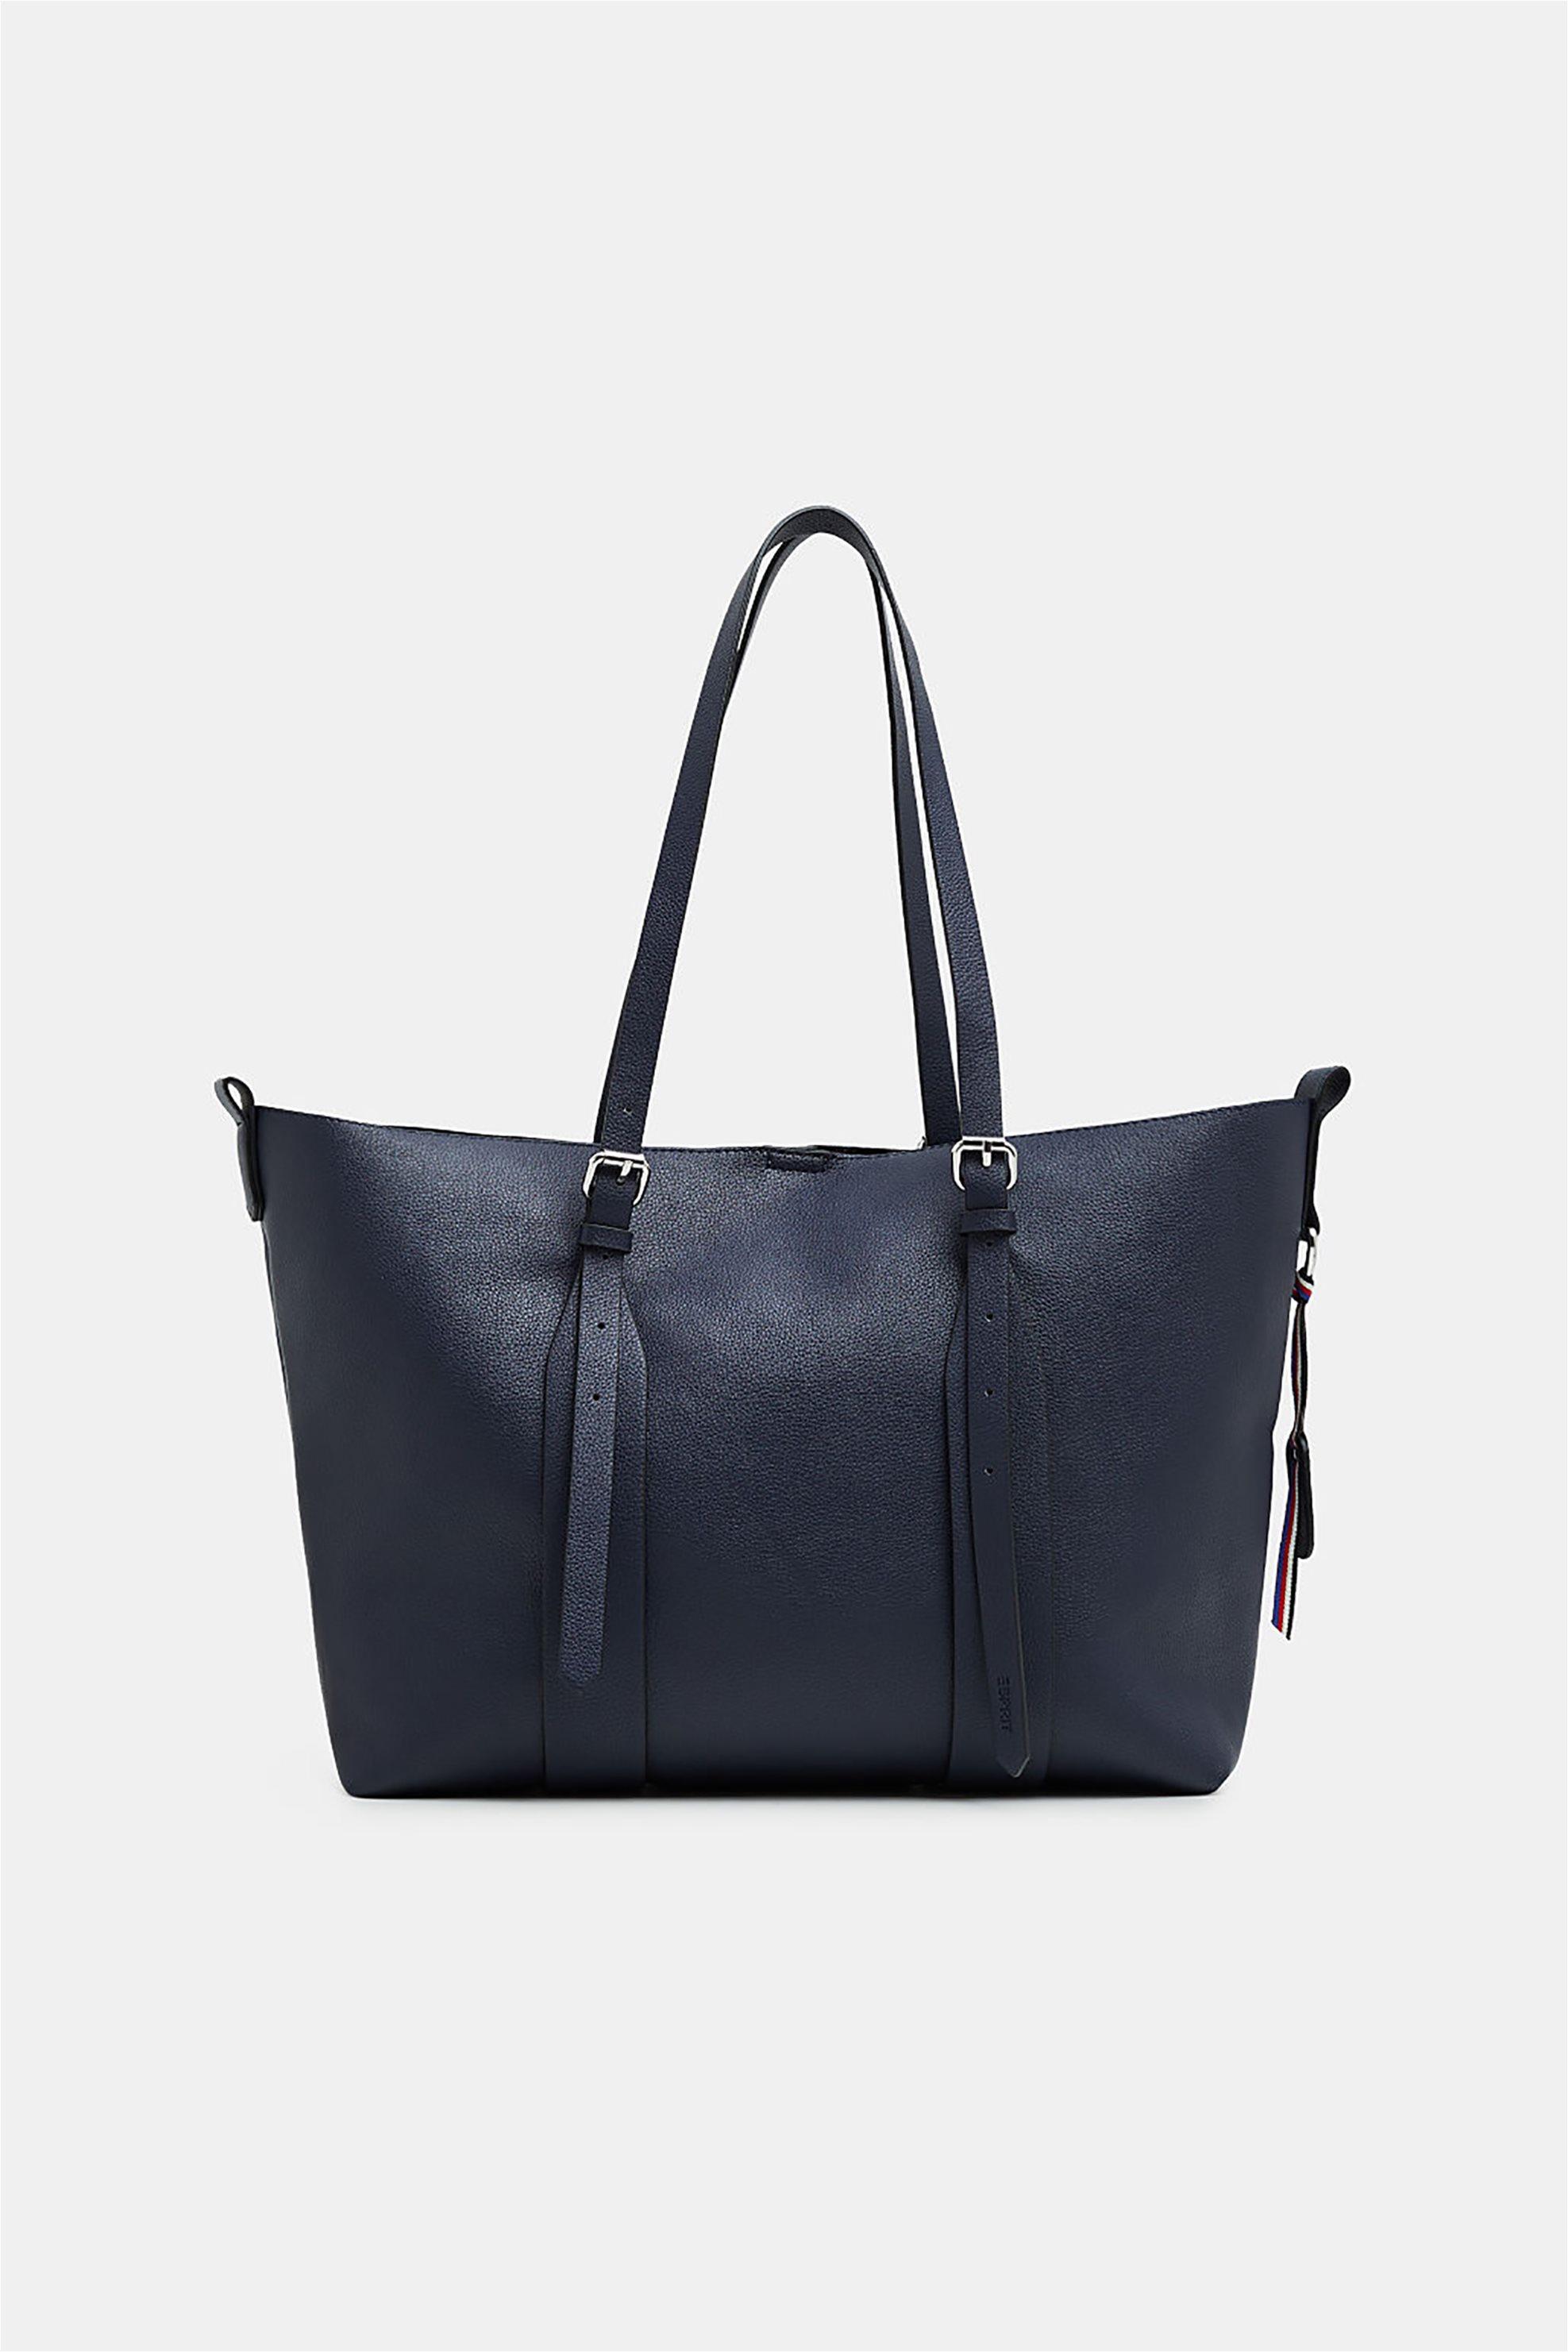 daf11a2e46 Esprit γυναικεία τσάντα ώμου με μεταλλικές λεπτομέρειες - 128EA1O008 - Μπλε  Σκούρο